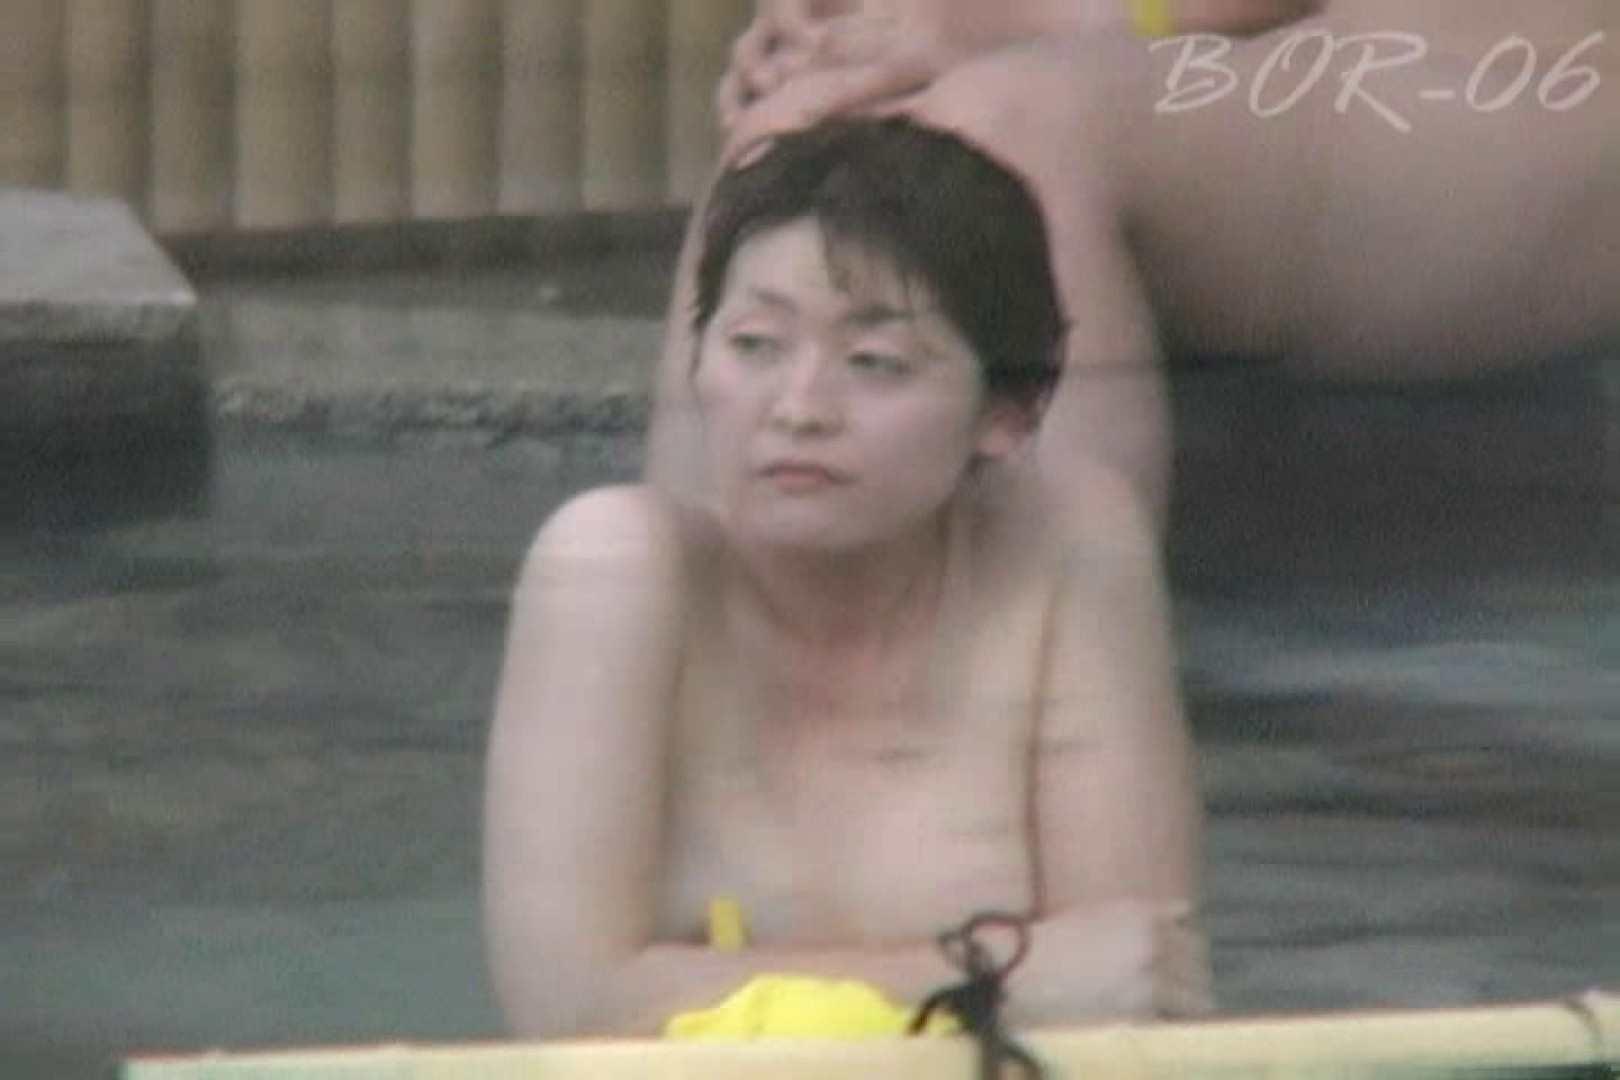 Aquaな露天風呂Vol.523 盗撮映像  93Pix 3